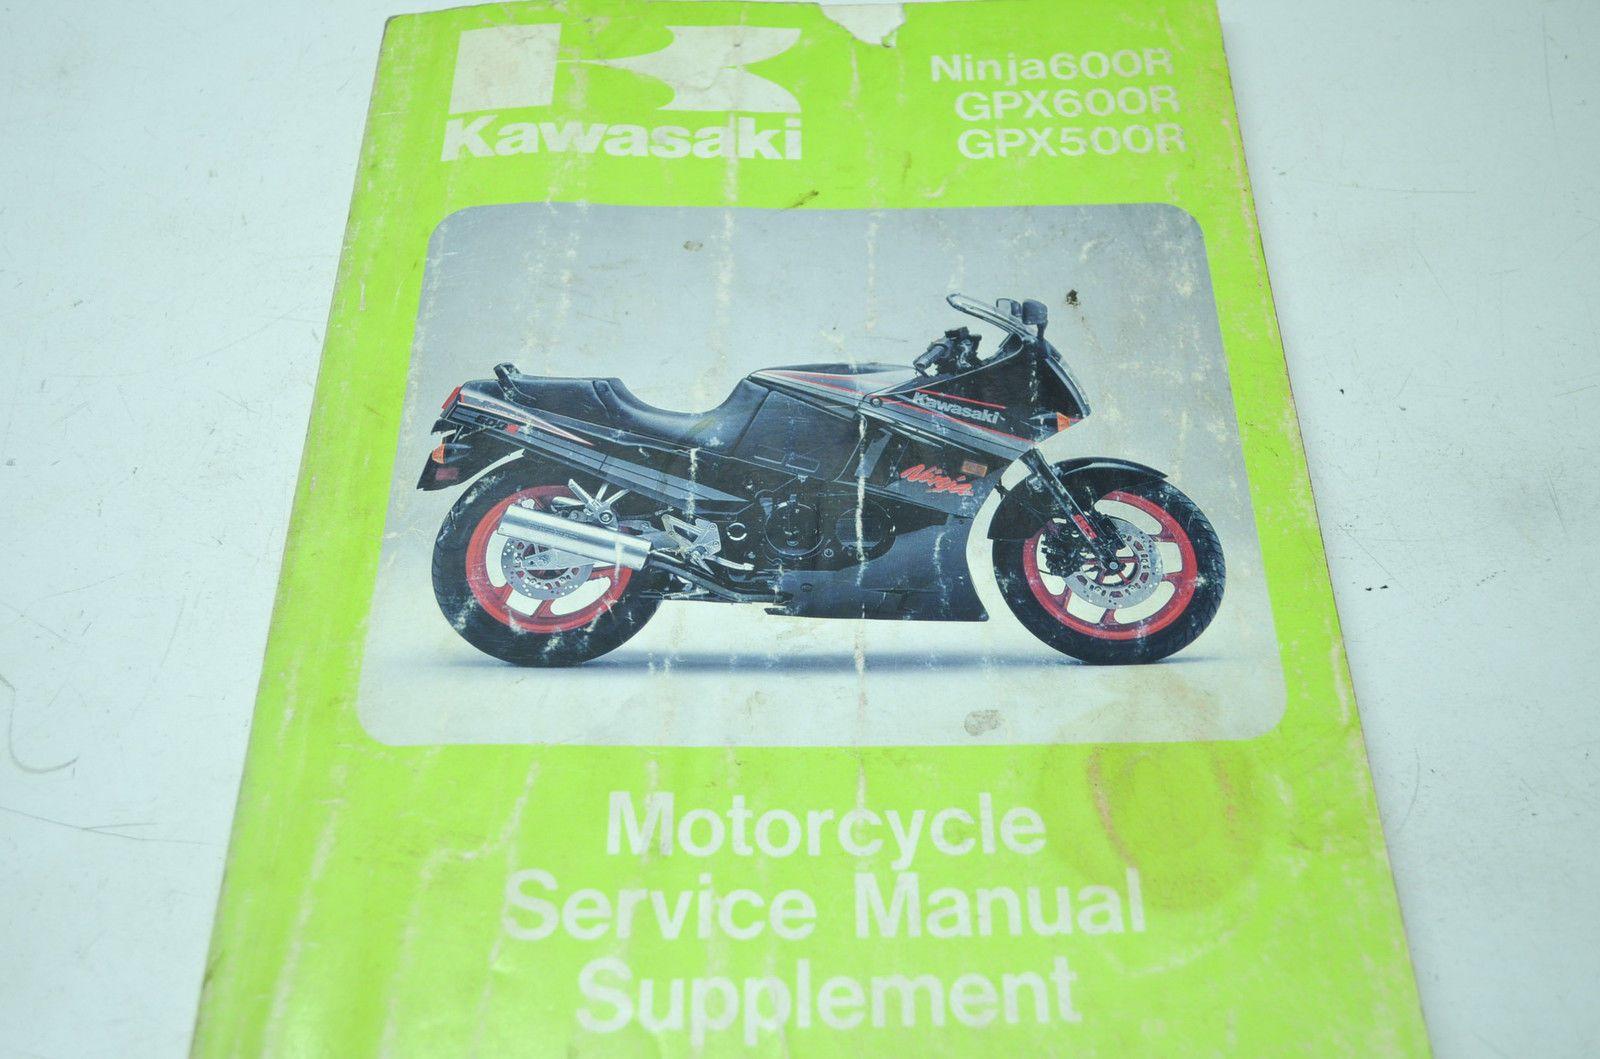 Kawasaki 88 Ninja GPX 600R GPX500R Service Manual Supplement   eBay